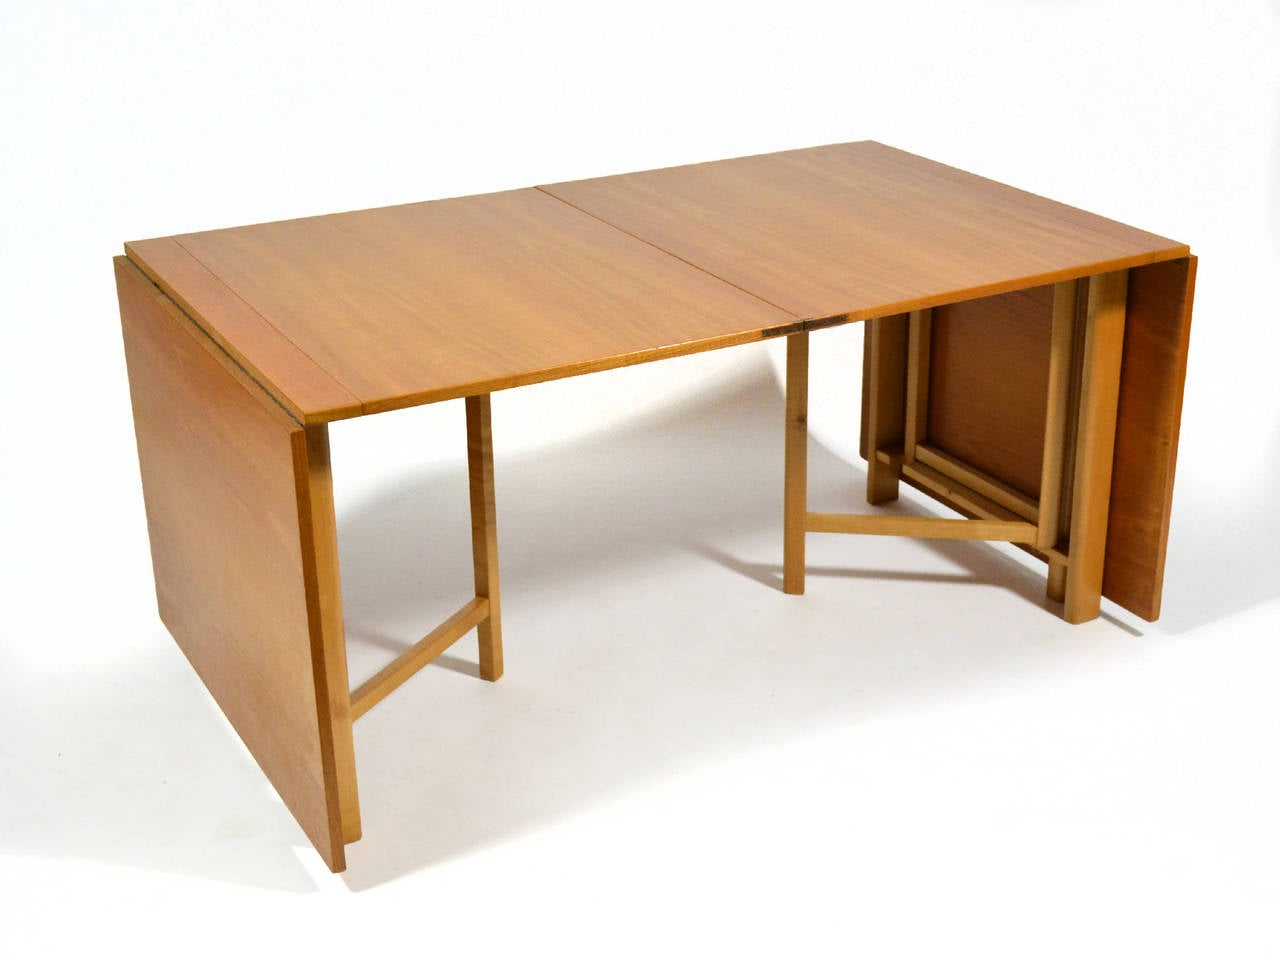 Bruno Mathsson Maria Expanding Or Folding Table At 1stdibs